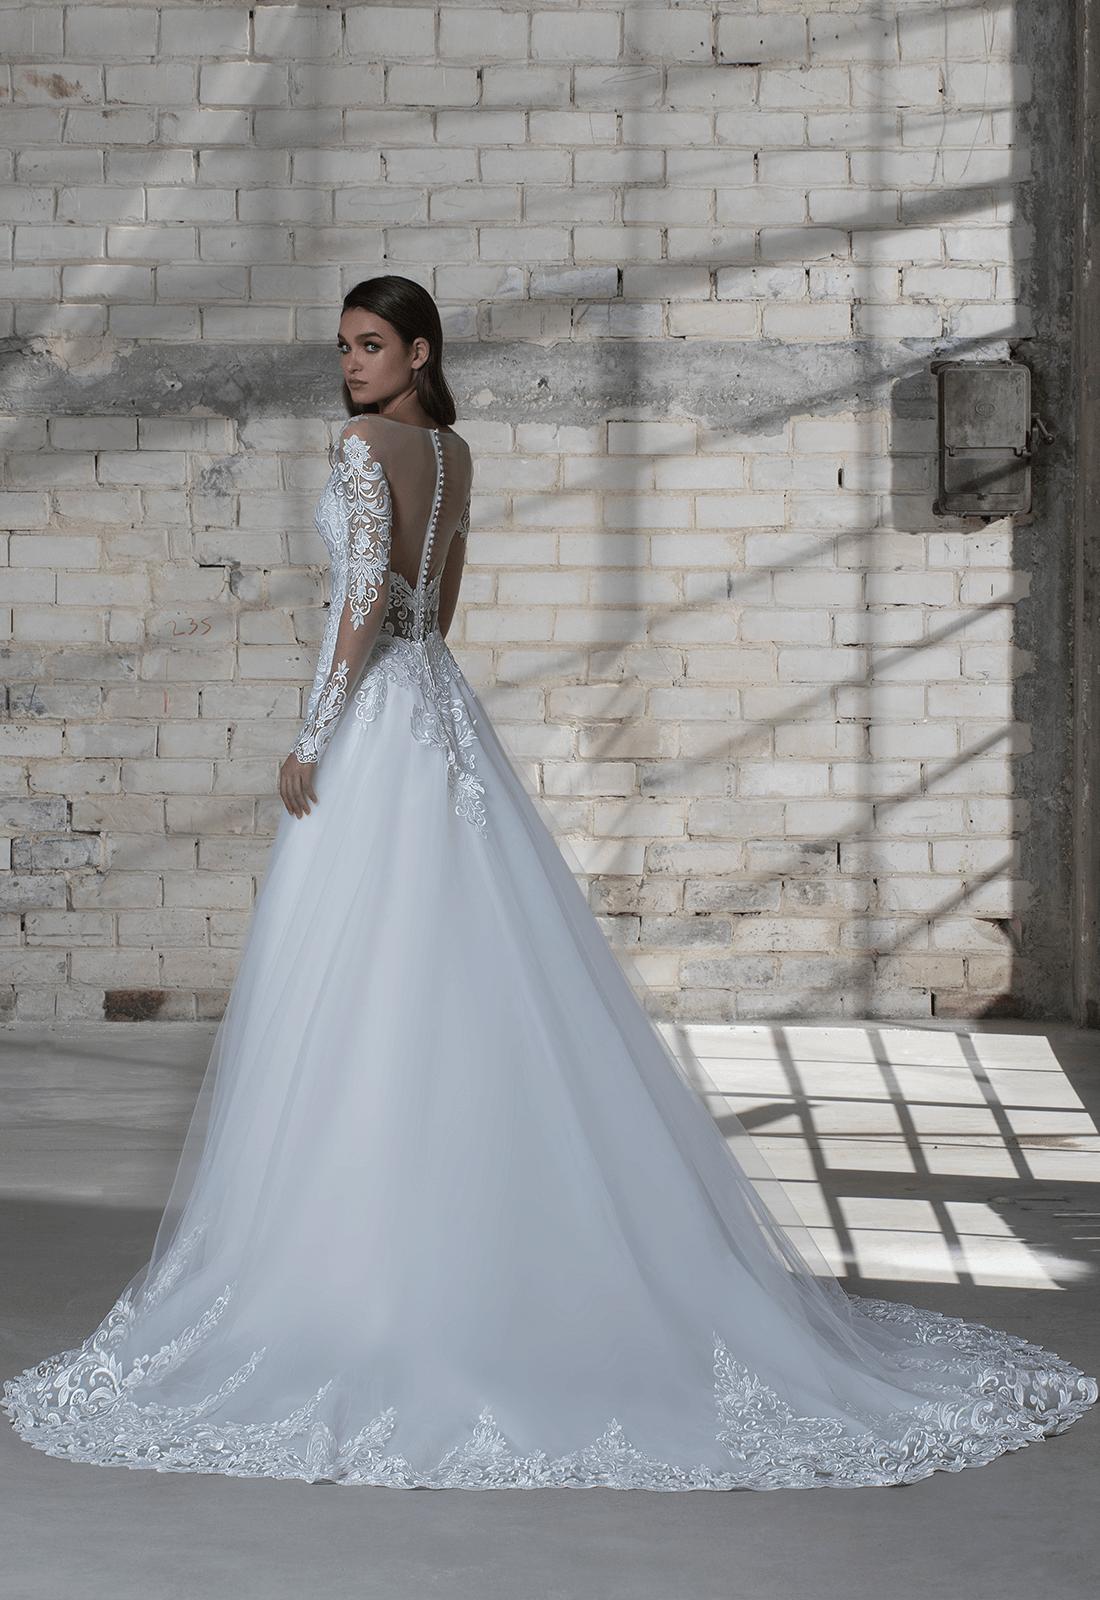 Luxury Panina Wedding Gowns Elaboration - All Wedding Dresses ...